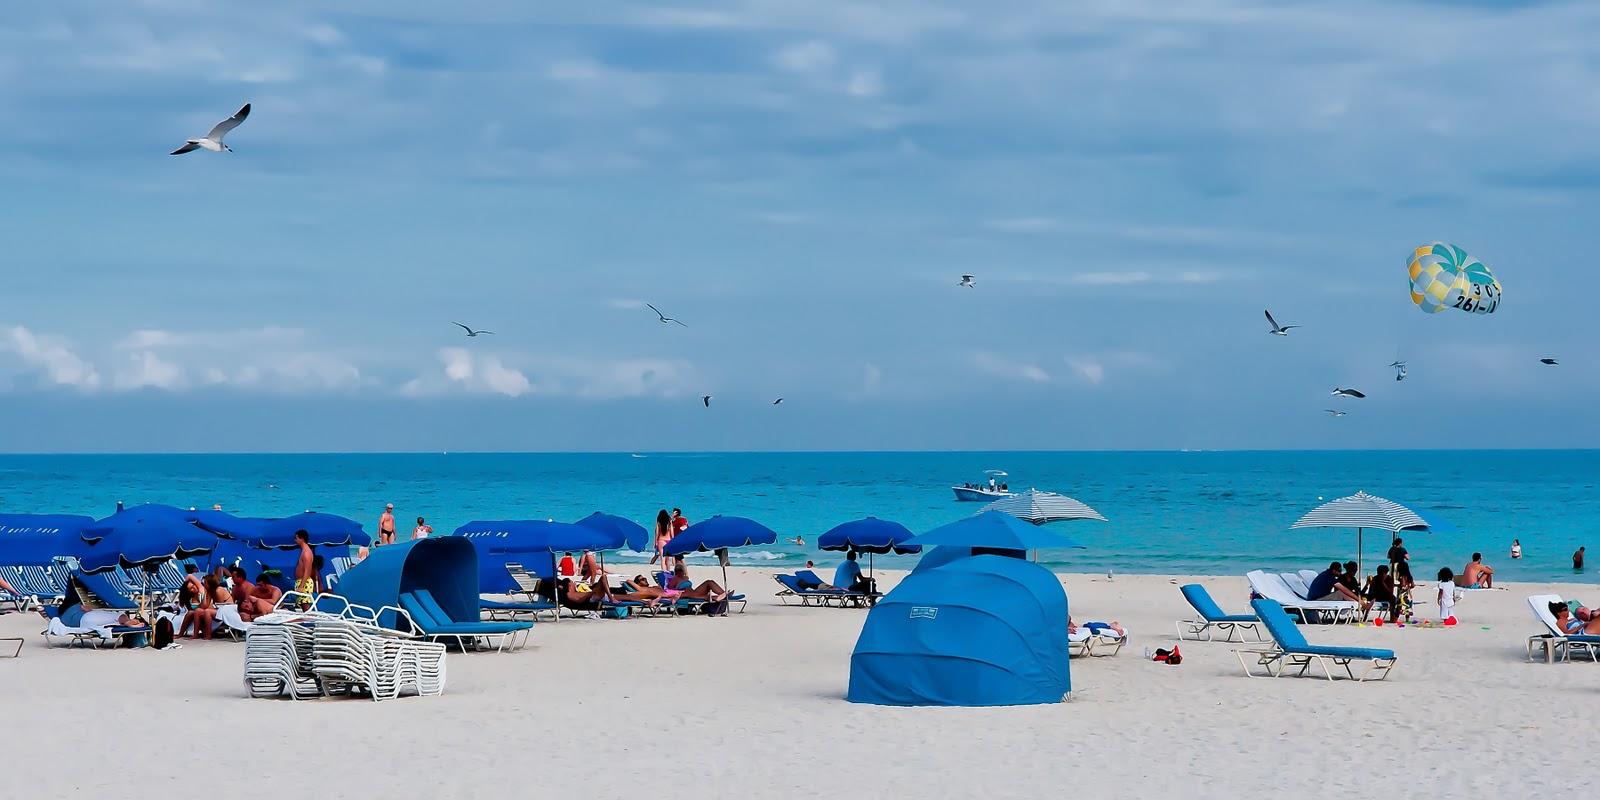 JP BRANDANO: FLORIDAS FINE ART PHOTOGRAPHERS: READ ALL